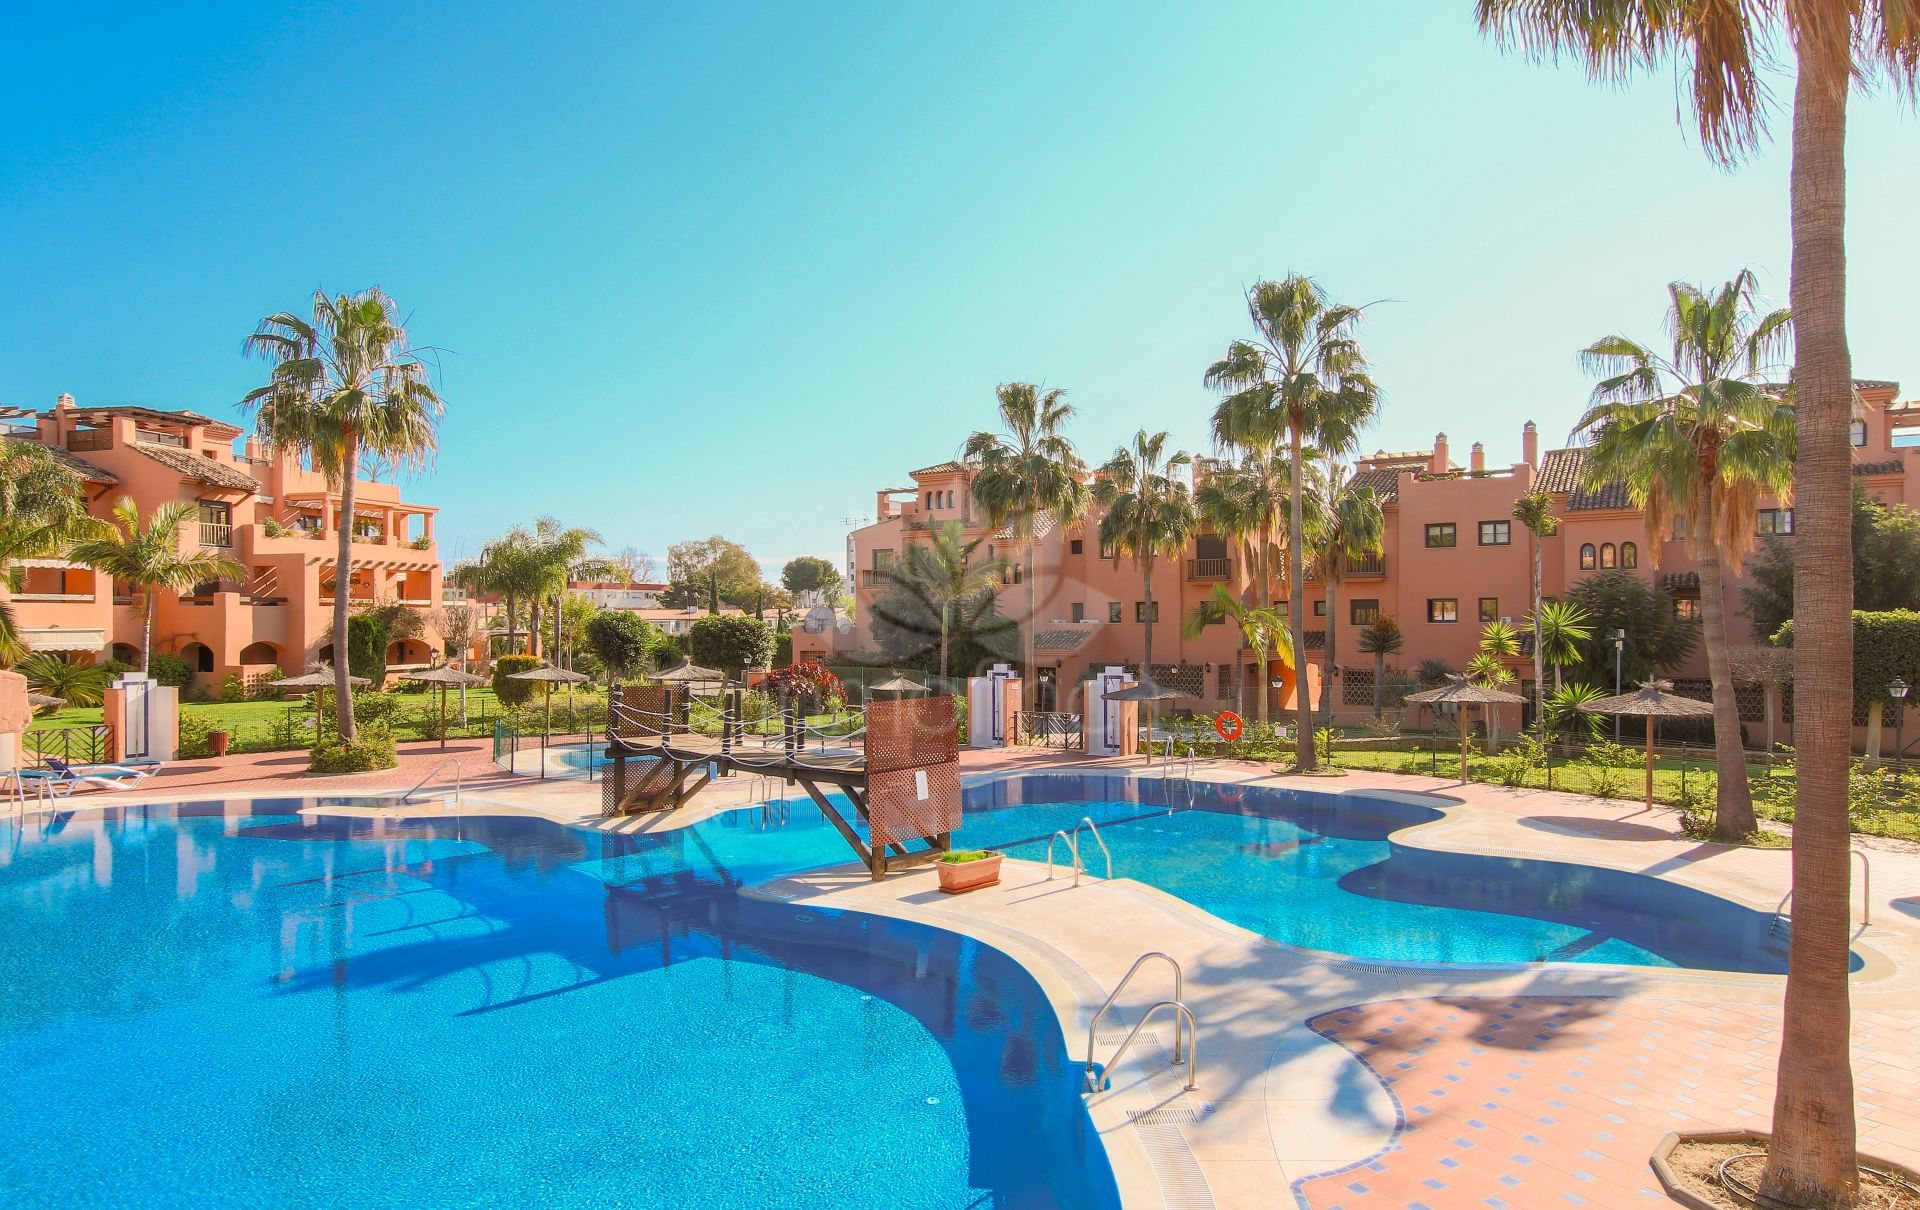 Apartment in Hacienda del Sol, Estepona